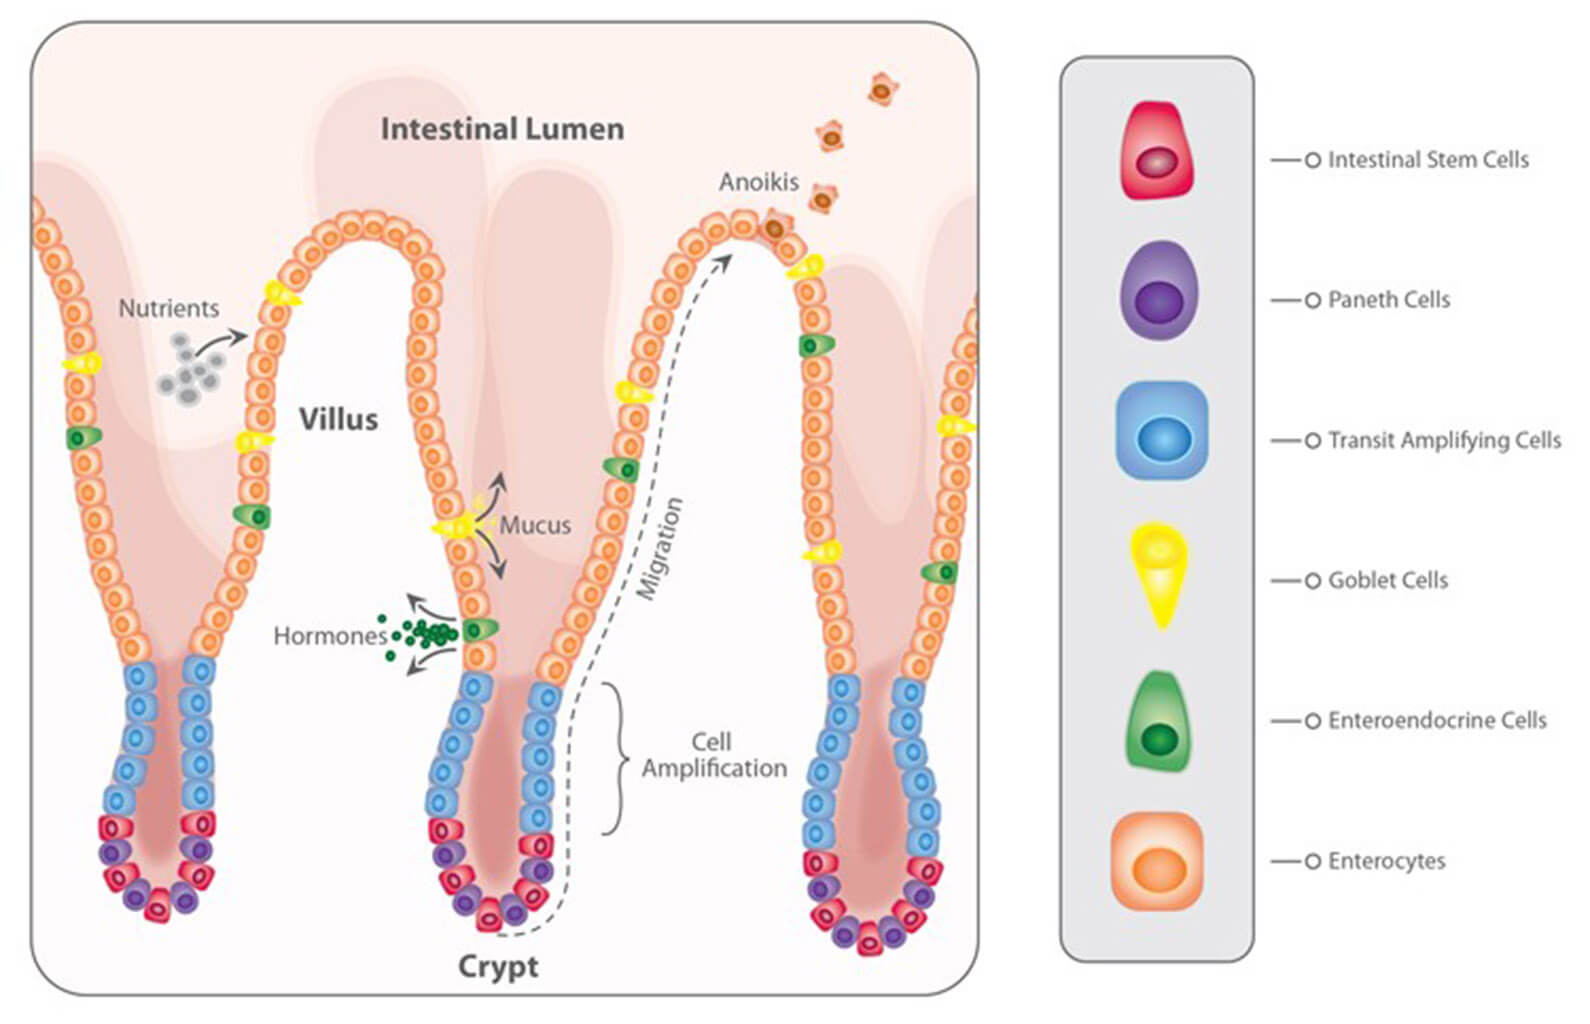 The intestinal epithelium